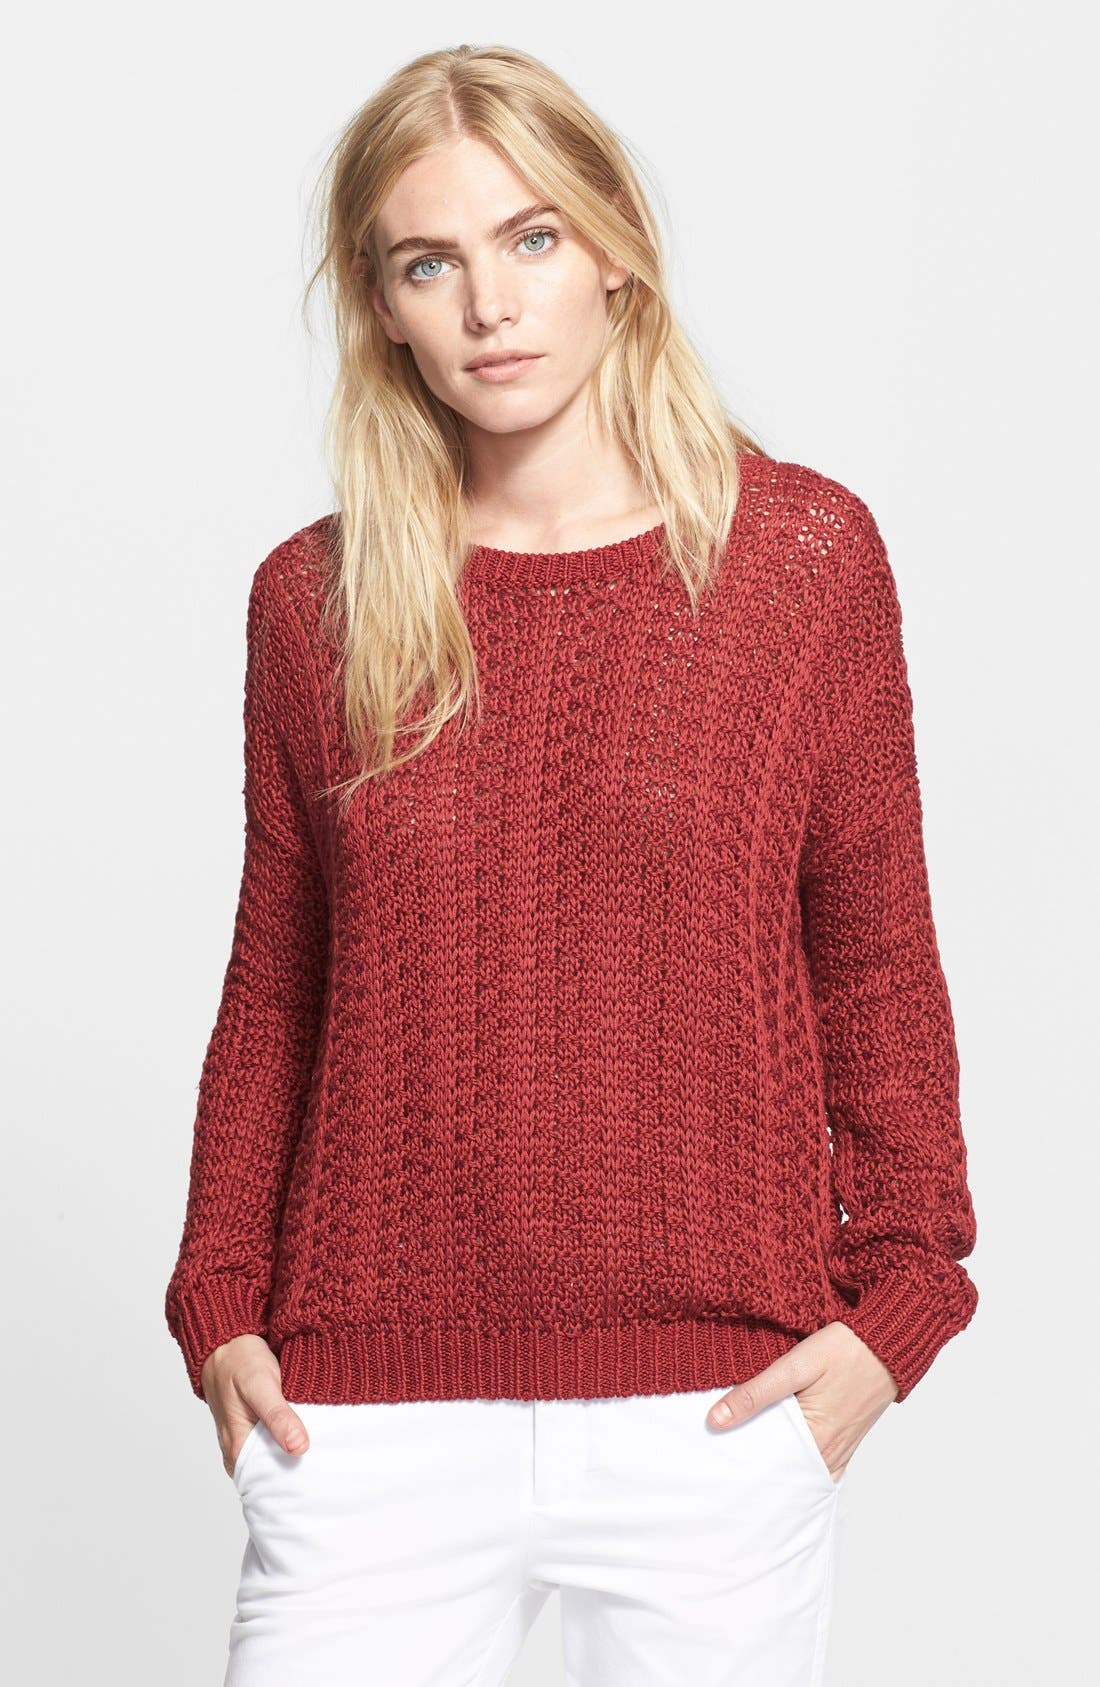 Alternate Image 1 Selected - Vince Mercerized Textured Sweater